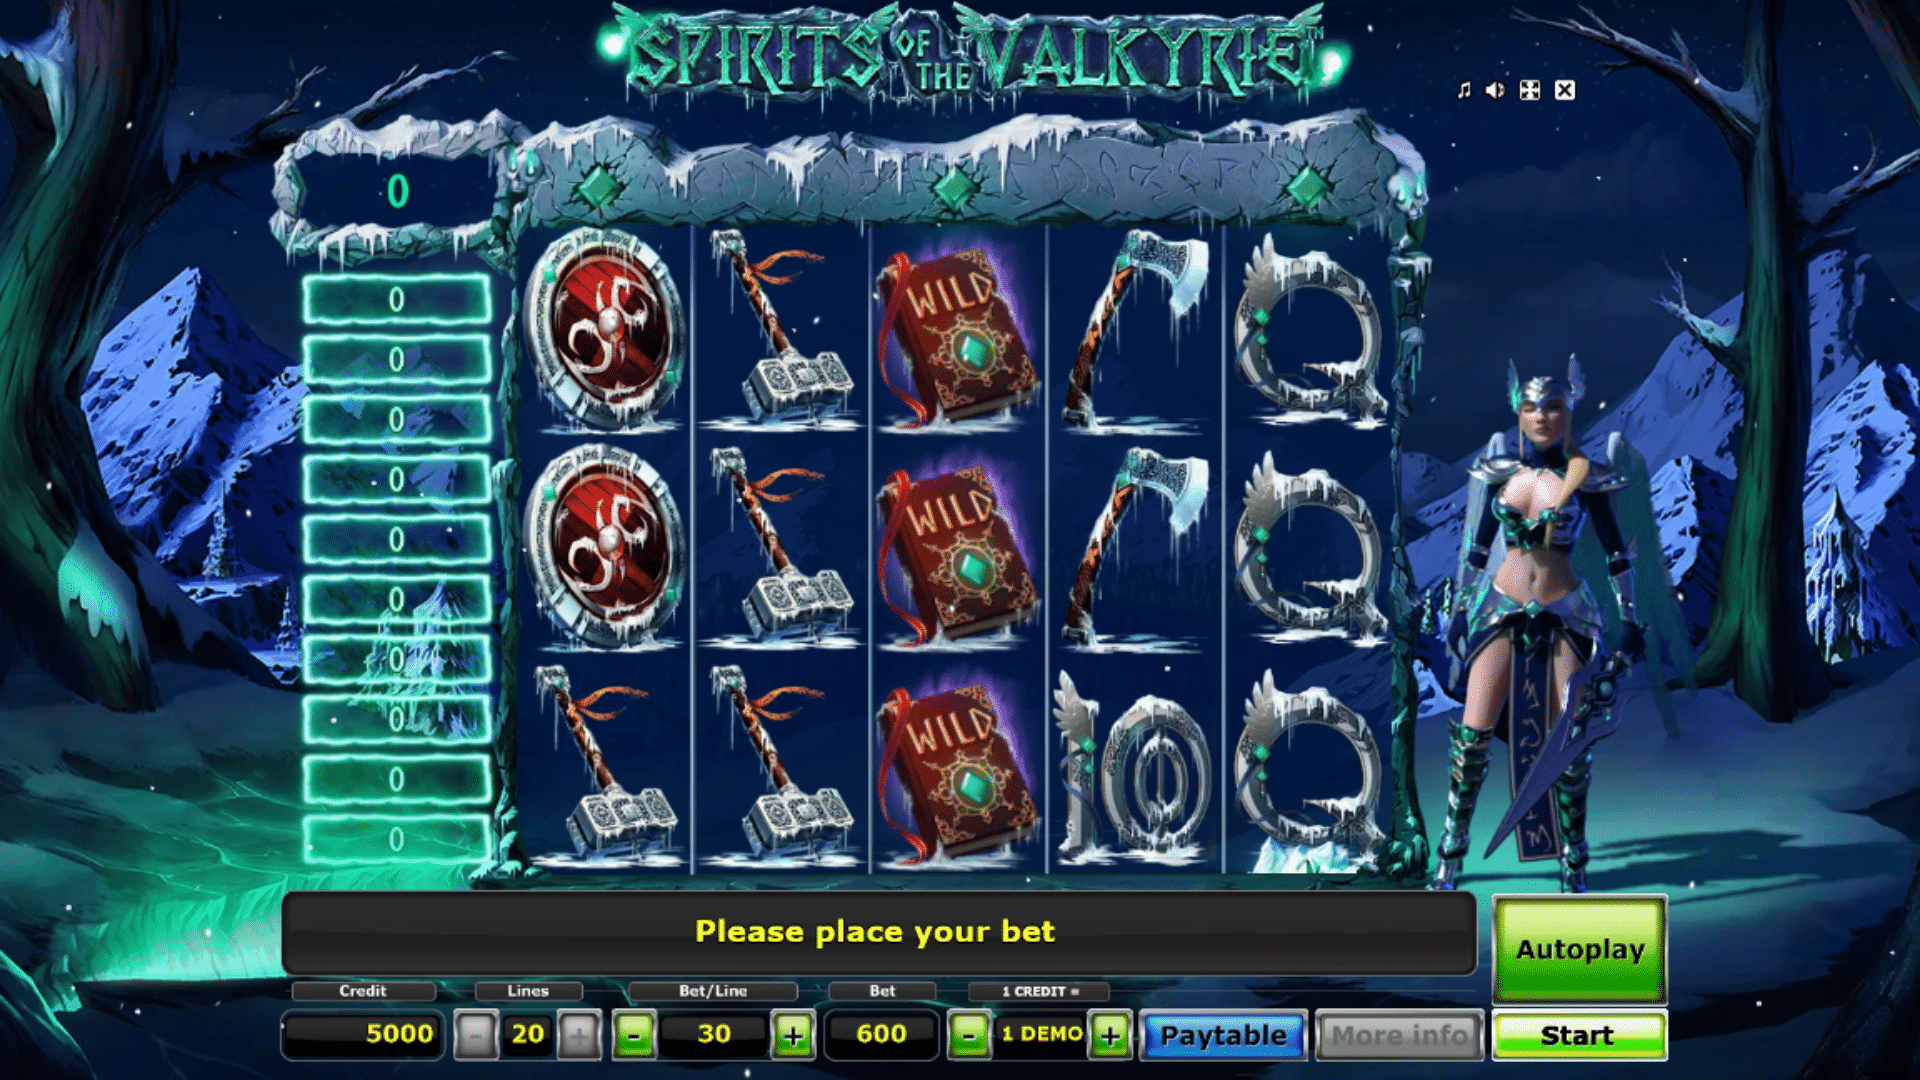 Slot Spirits of the Valkyrie